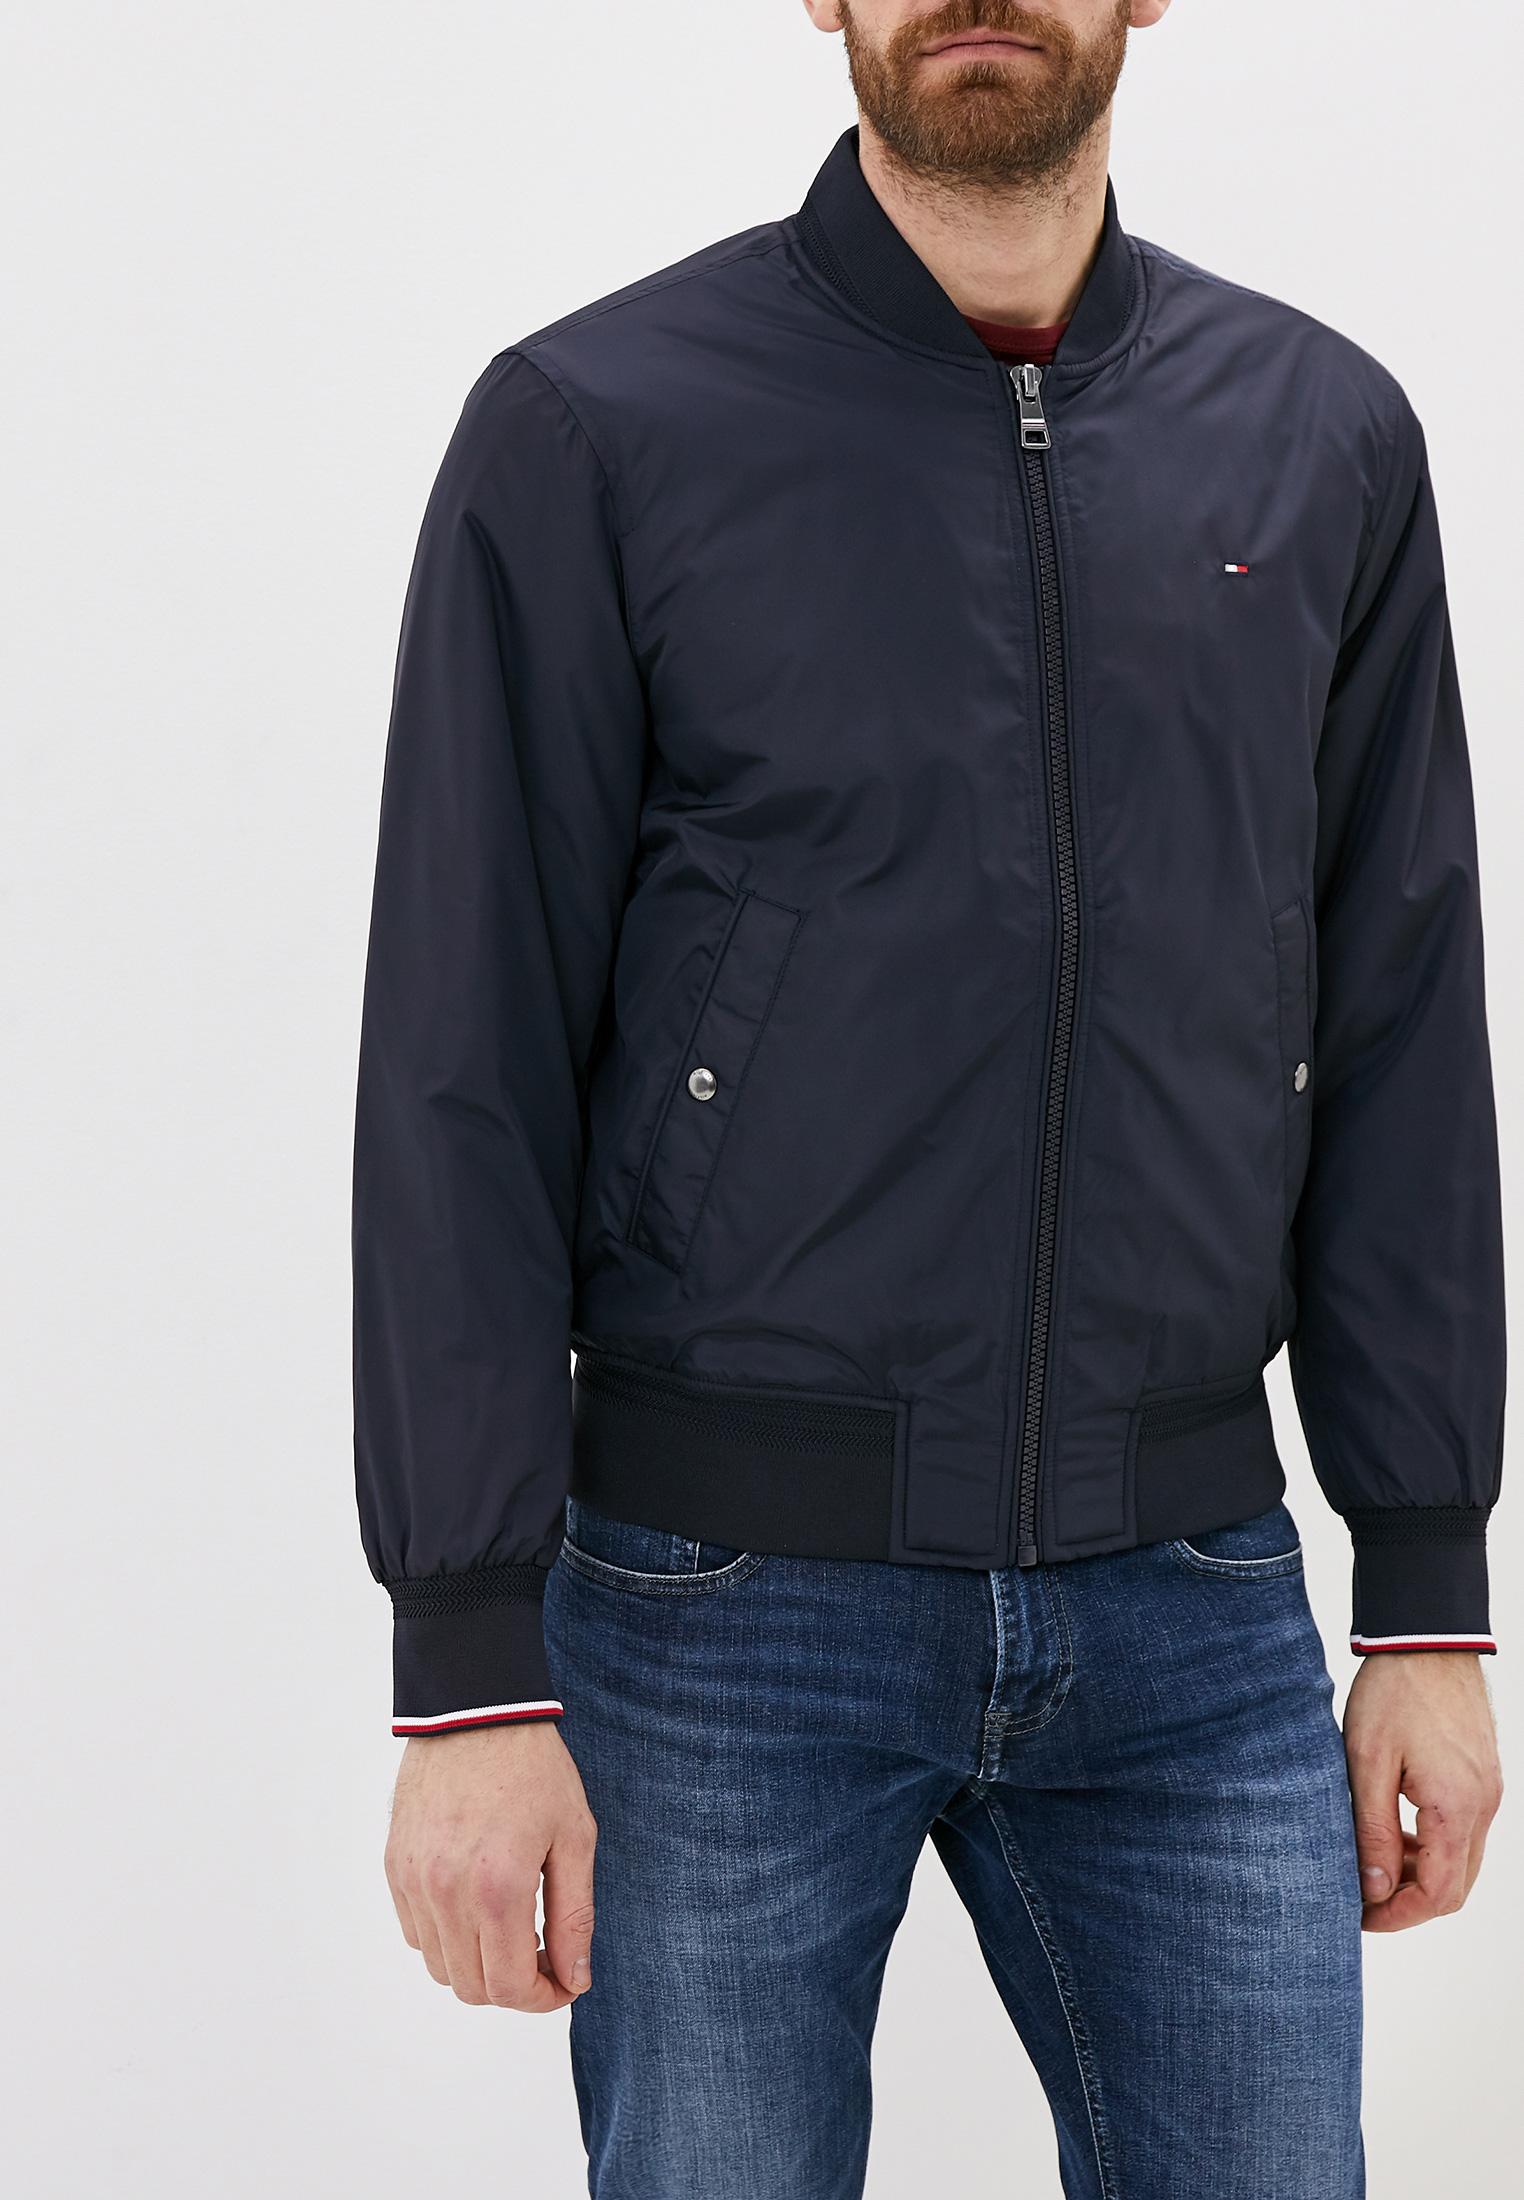 Куртка Tommy Hilfiger (Томми Хилфигер) MW0MW12006: изображение 1